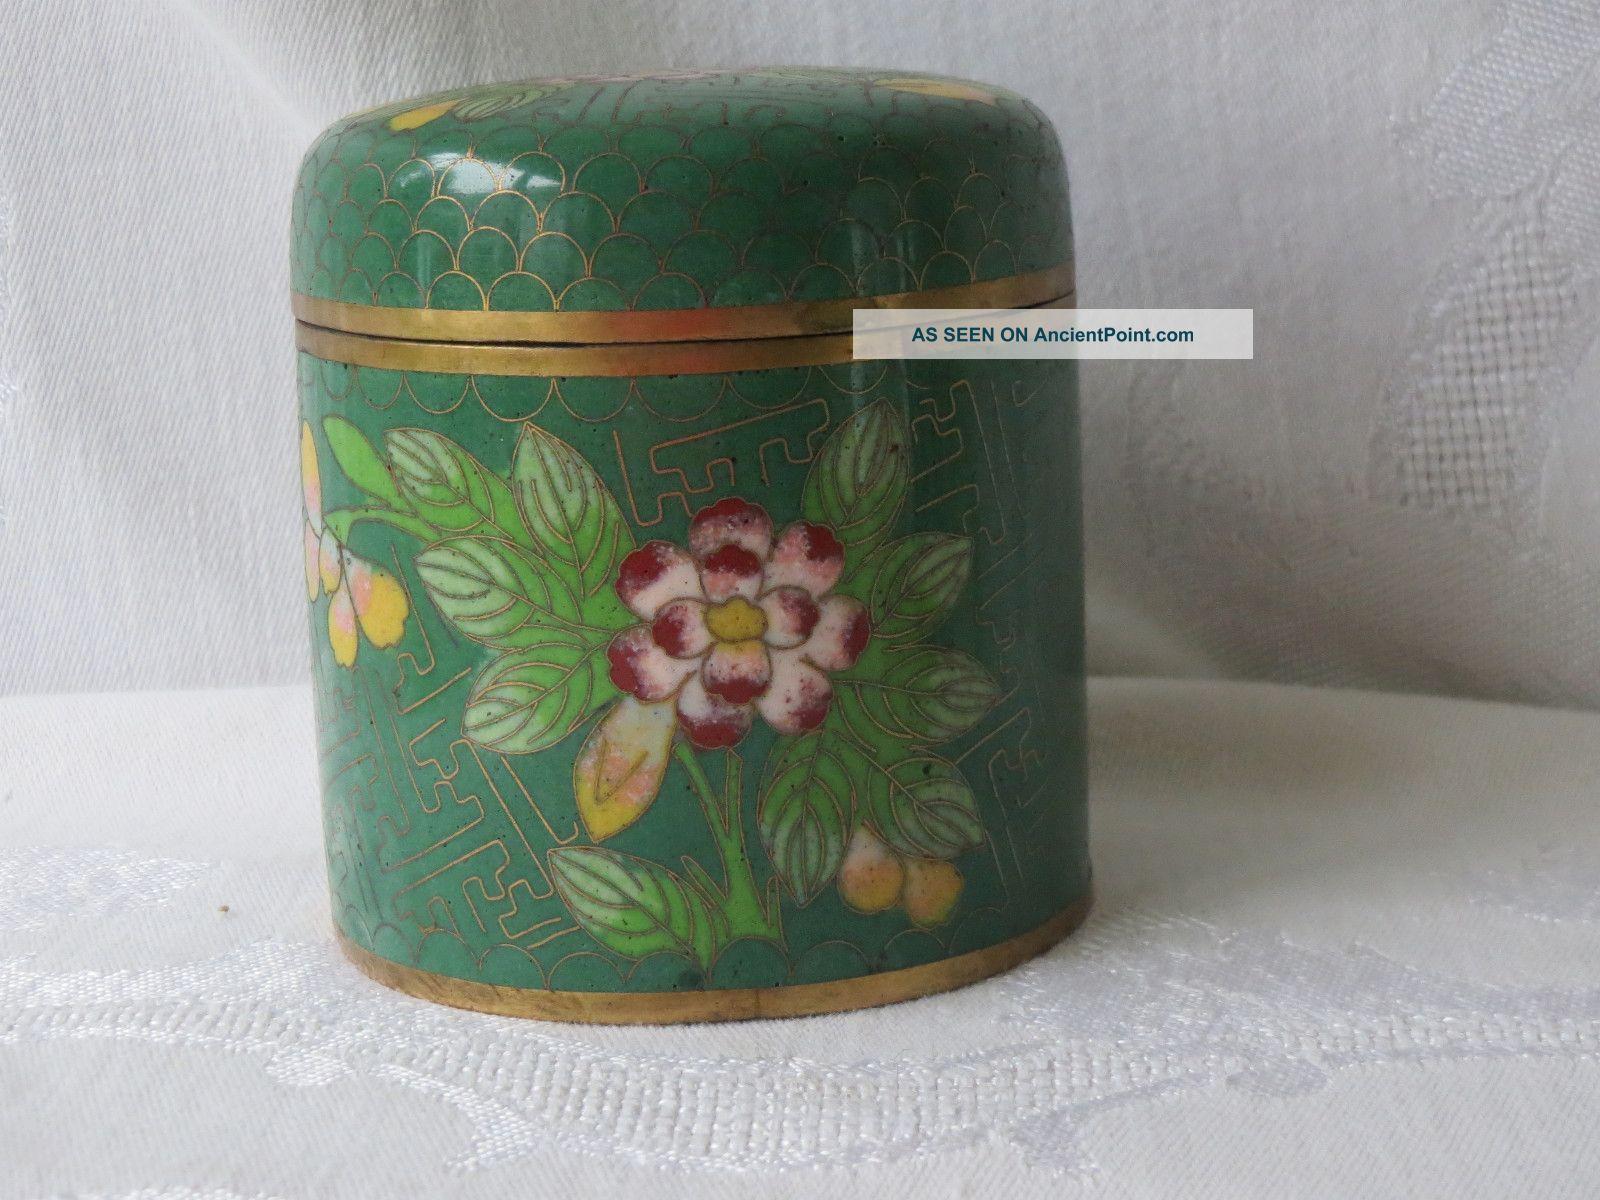 Antique Chinese Cloisonne Enamel Brass Design Flowers Box Boxes photo